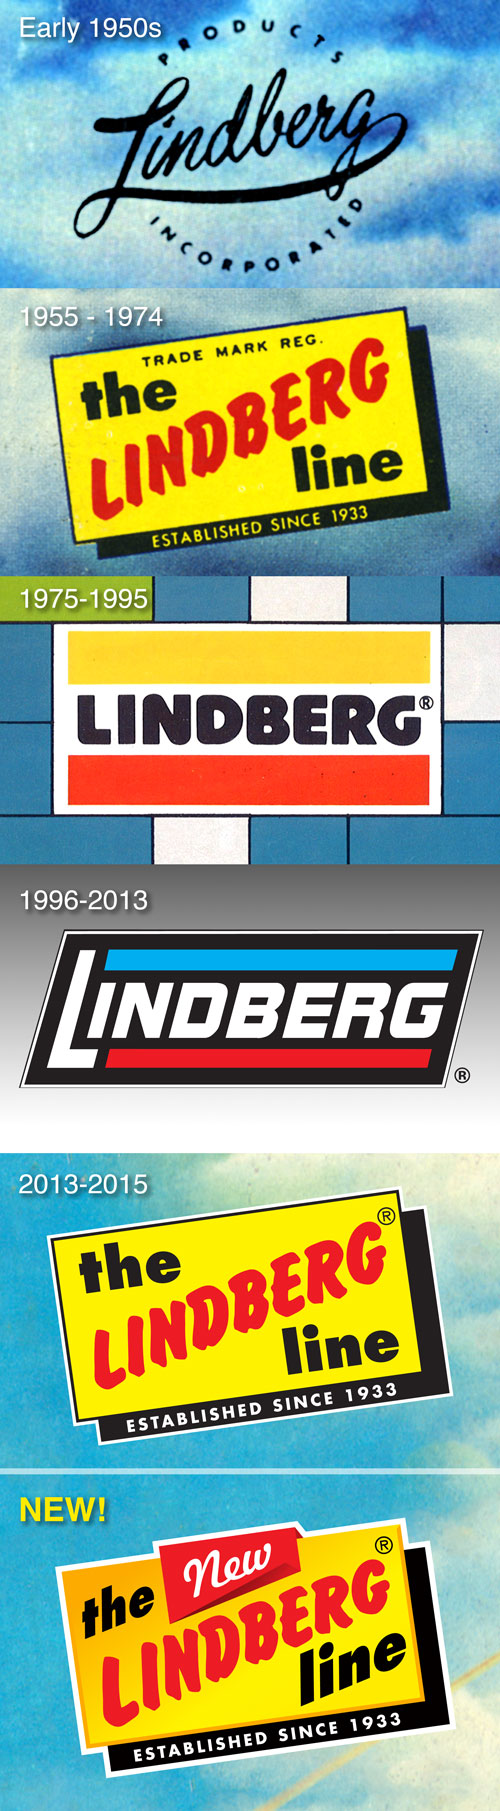 Lindberg_logo_history